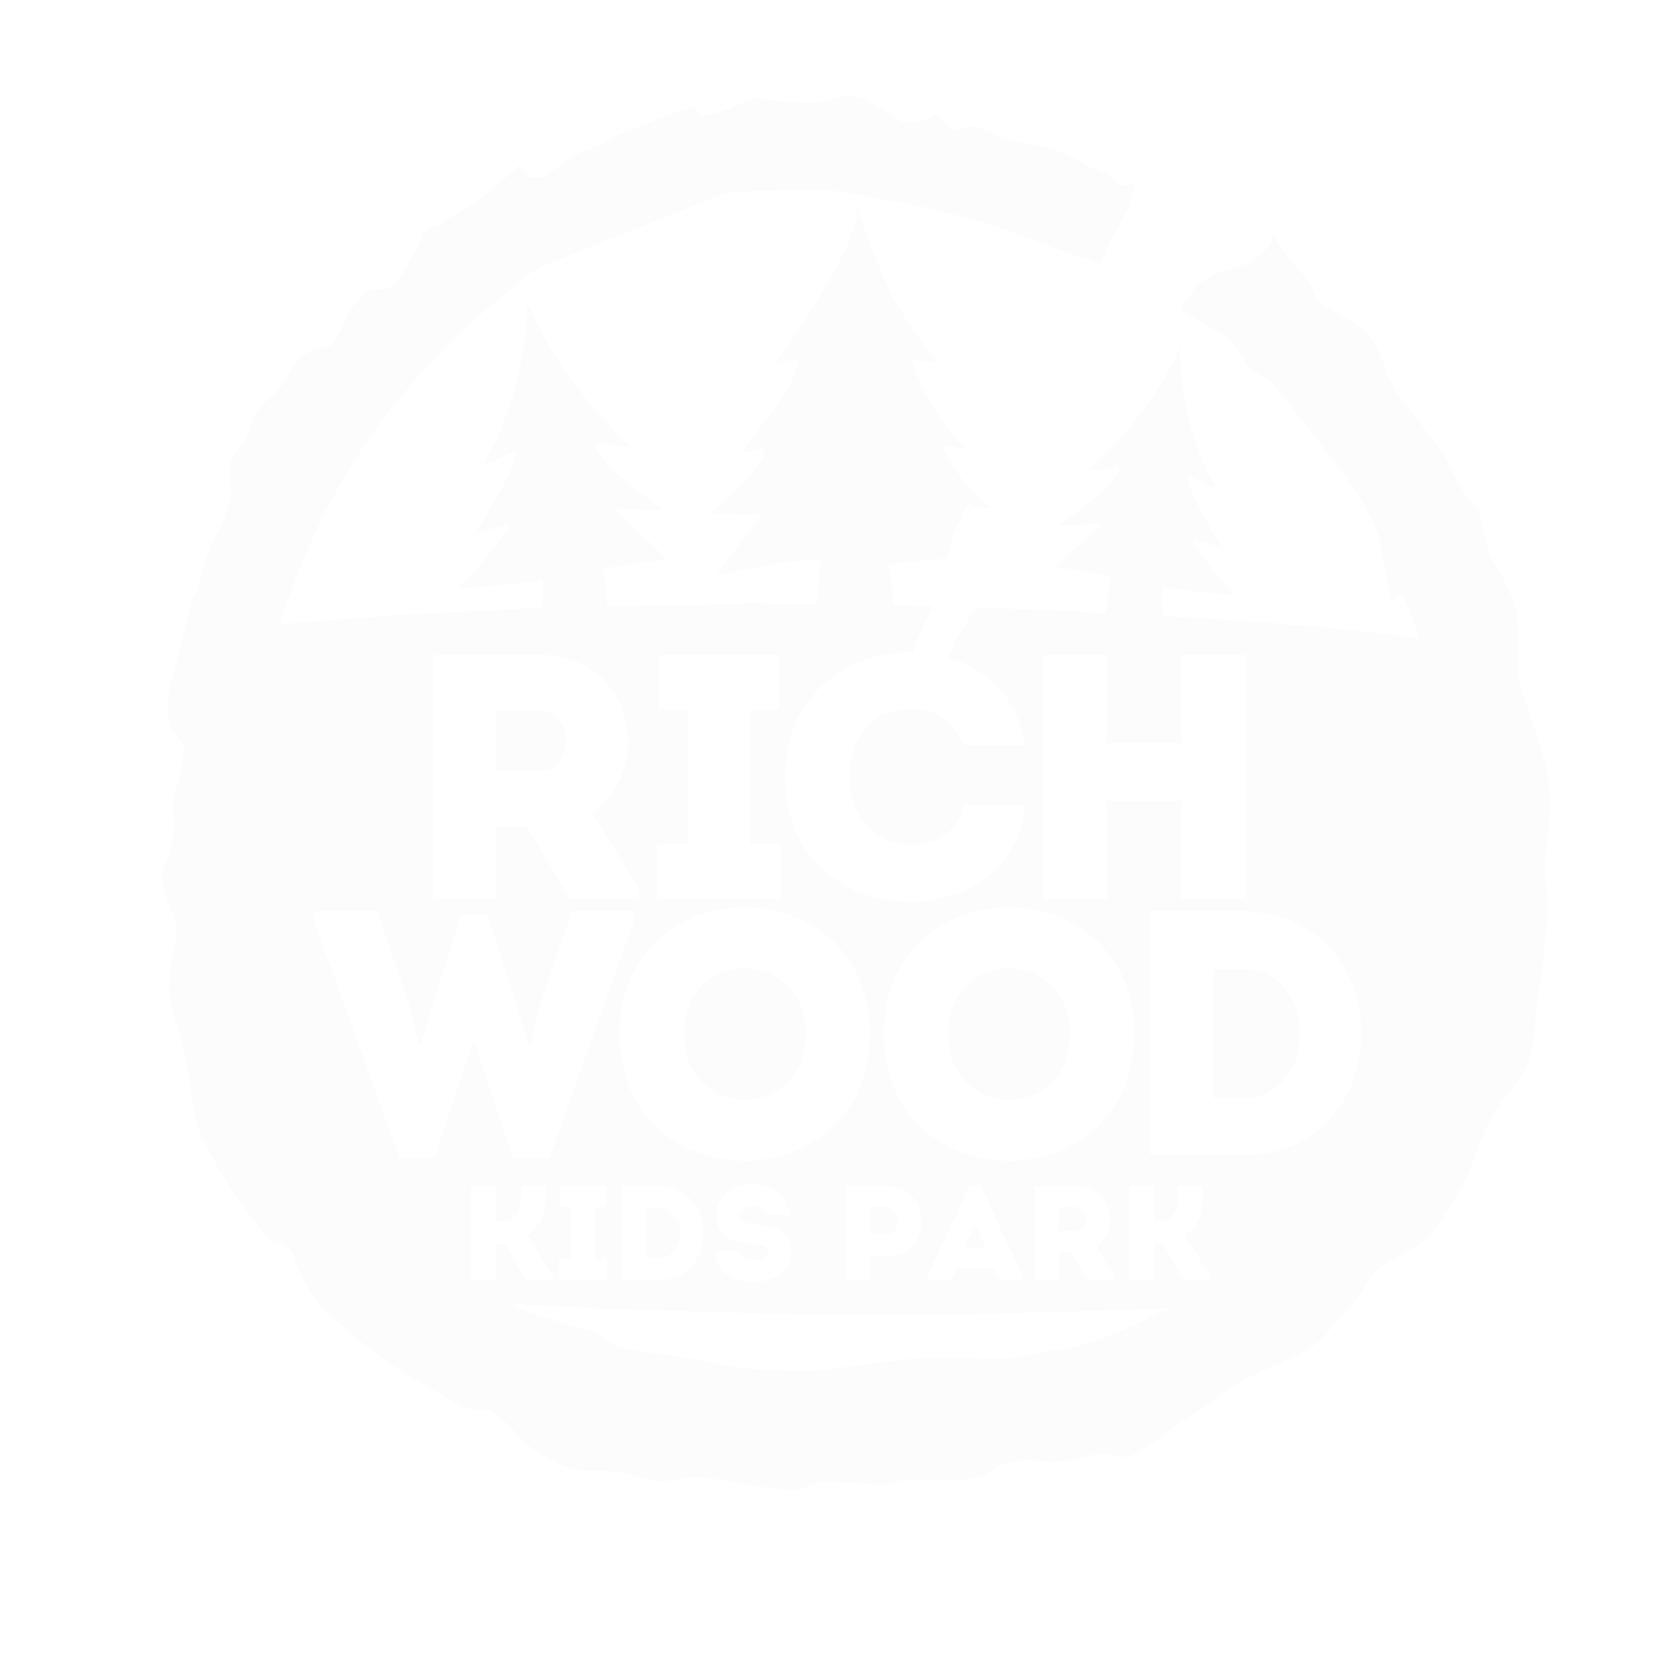 RICHWOOD KIDS PARK